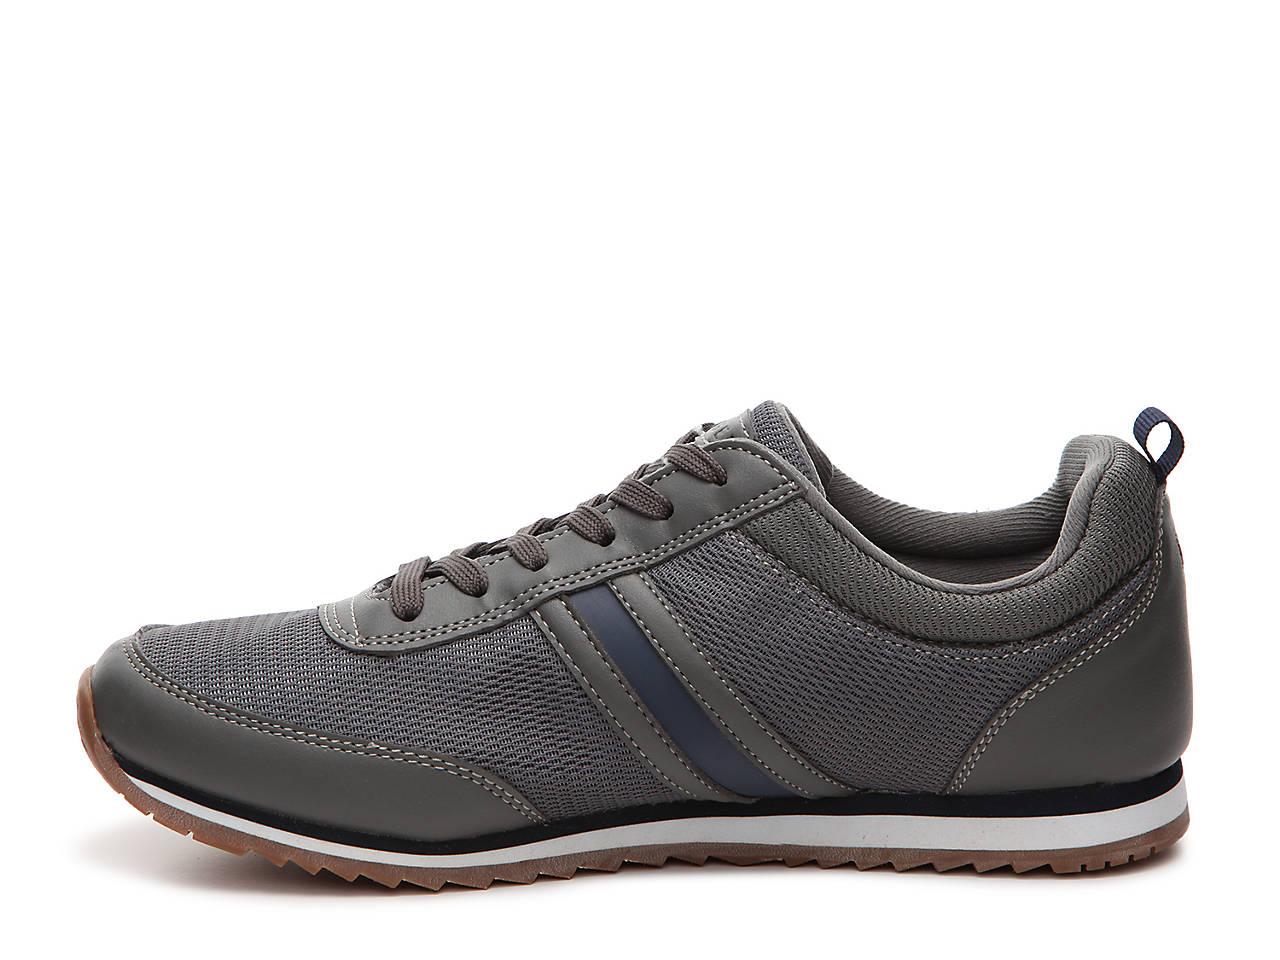 0bc3c24cca4bf Tommy Hilfiger Fonzie Retro Sneaker Men s Shoes